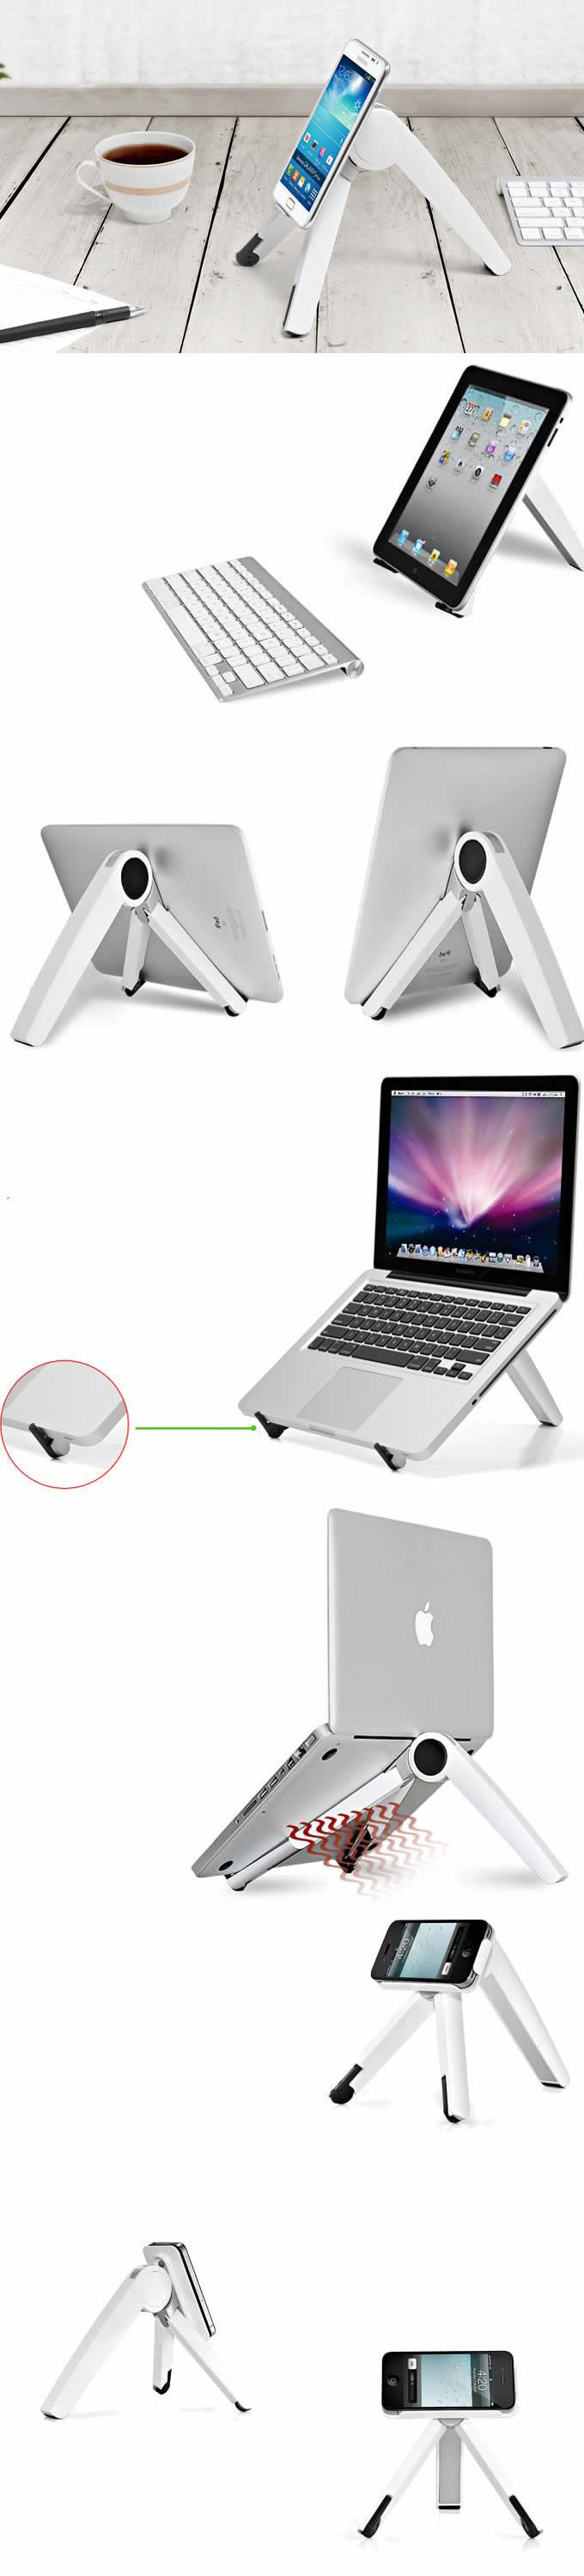 Adjustable Aluminum Alloy Universal Laptop Notebook iPad Smartphone Stand Holder